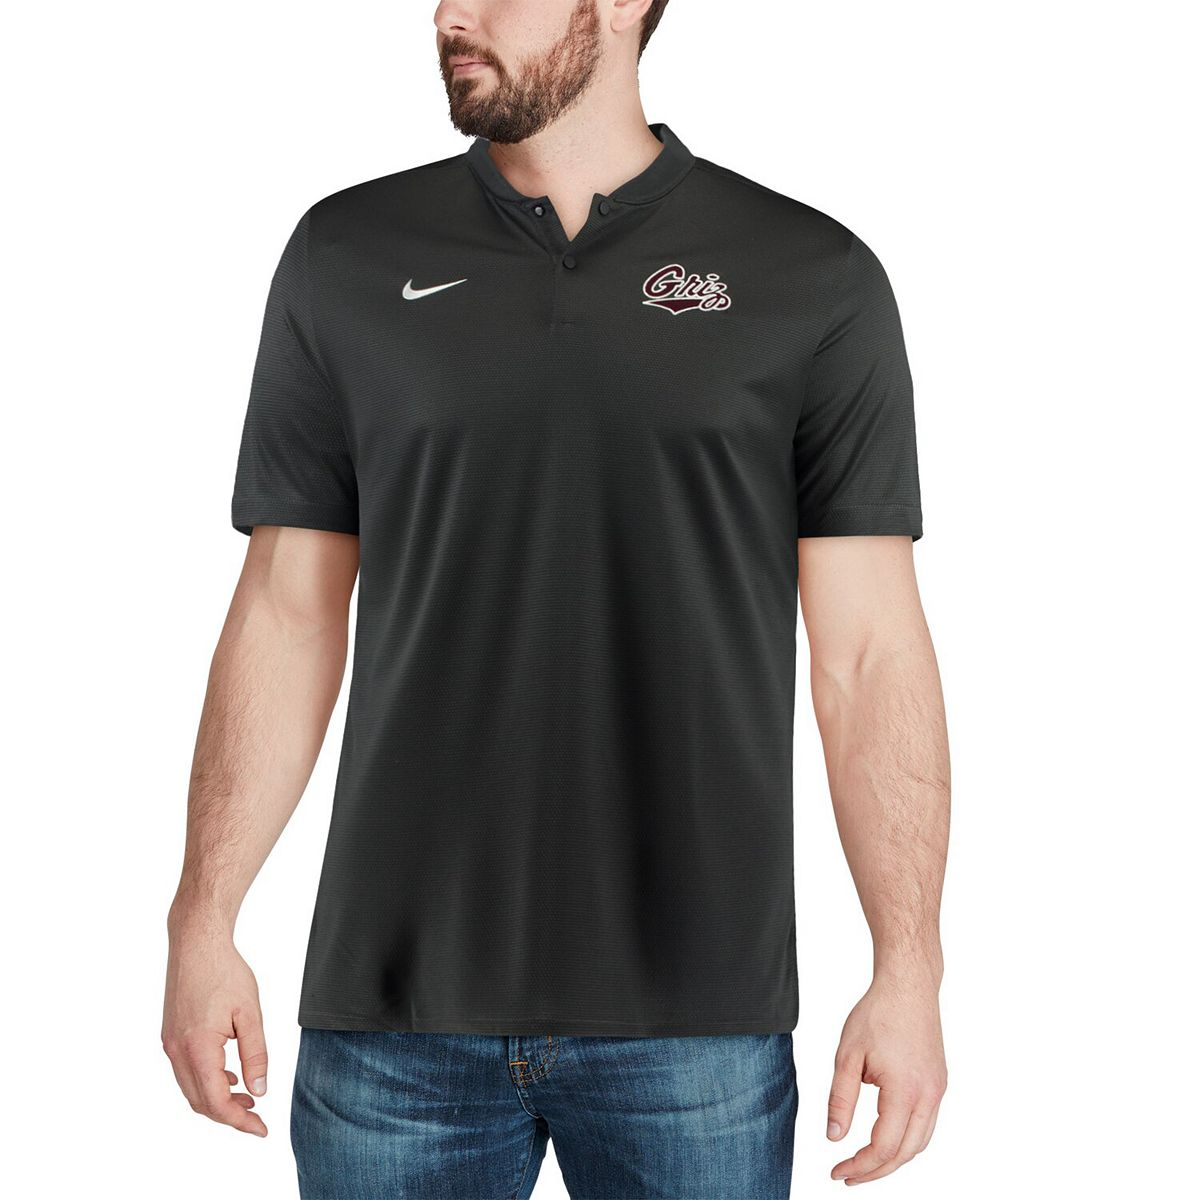 Men's Nike Anthracite Montana Grizzlies 2018 Elite Coaches Sideline Blade Collar Polo A73Al